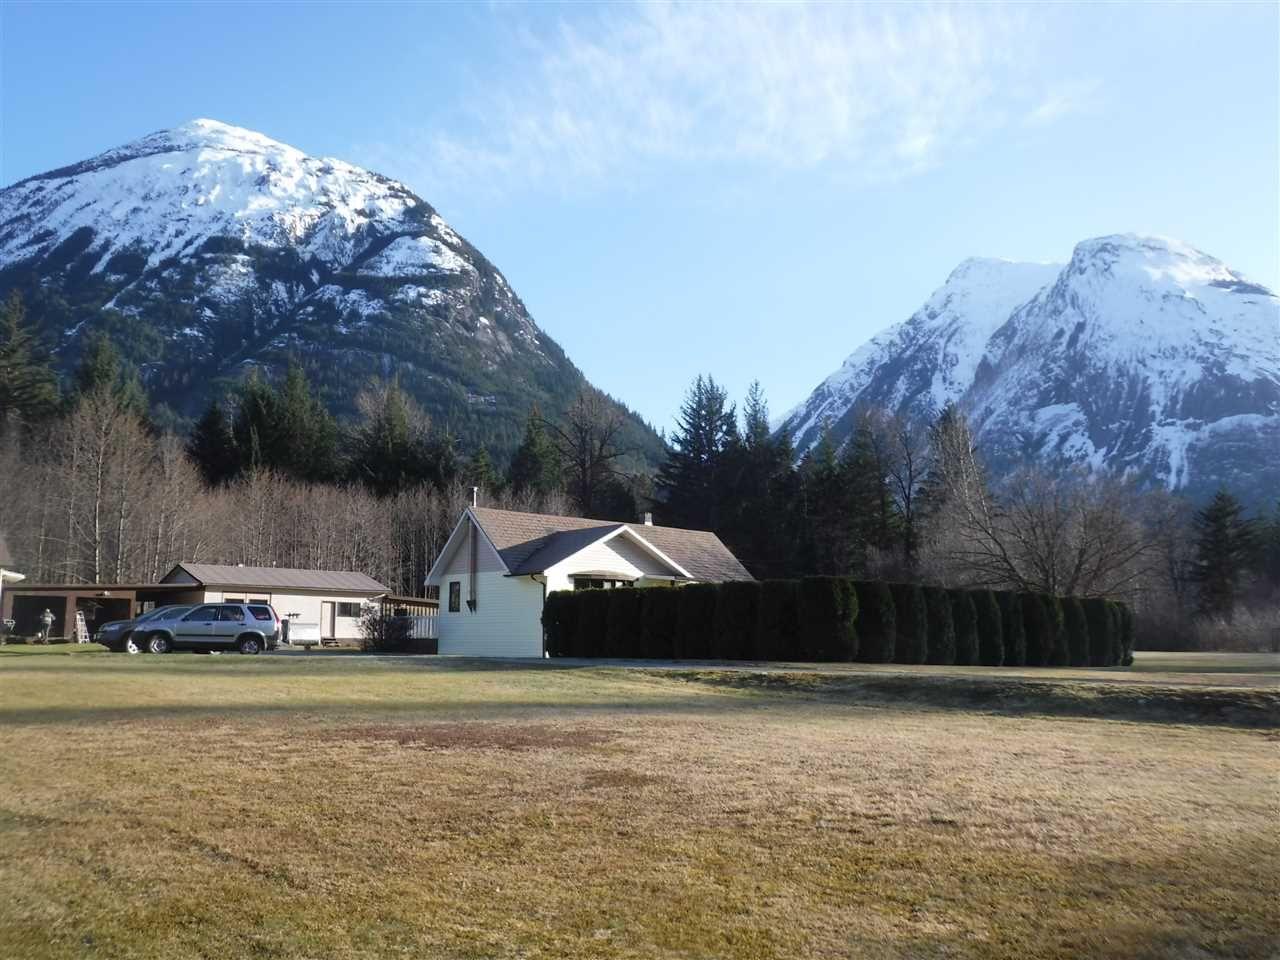 Photo 3: Photos: 1599 MACKENZIE Highway in Bella Coola: Bella Coola/Hagensborg House for sale (Williams Lake (Zone 27))  : MLS®# R2449026